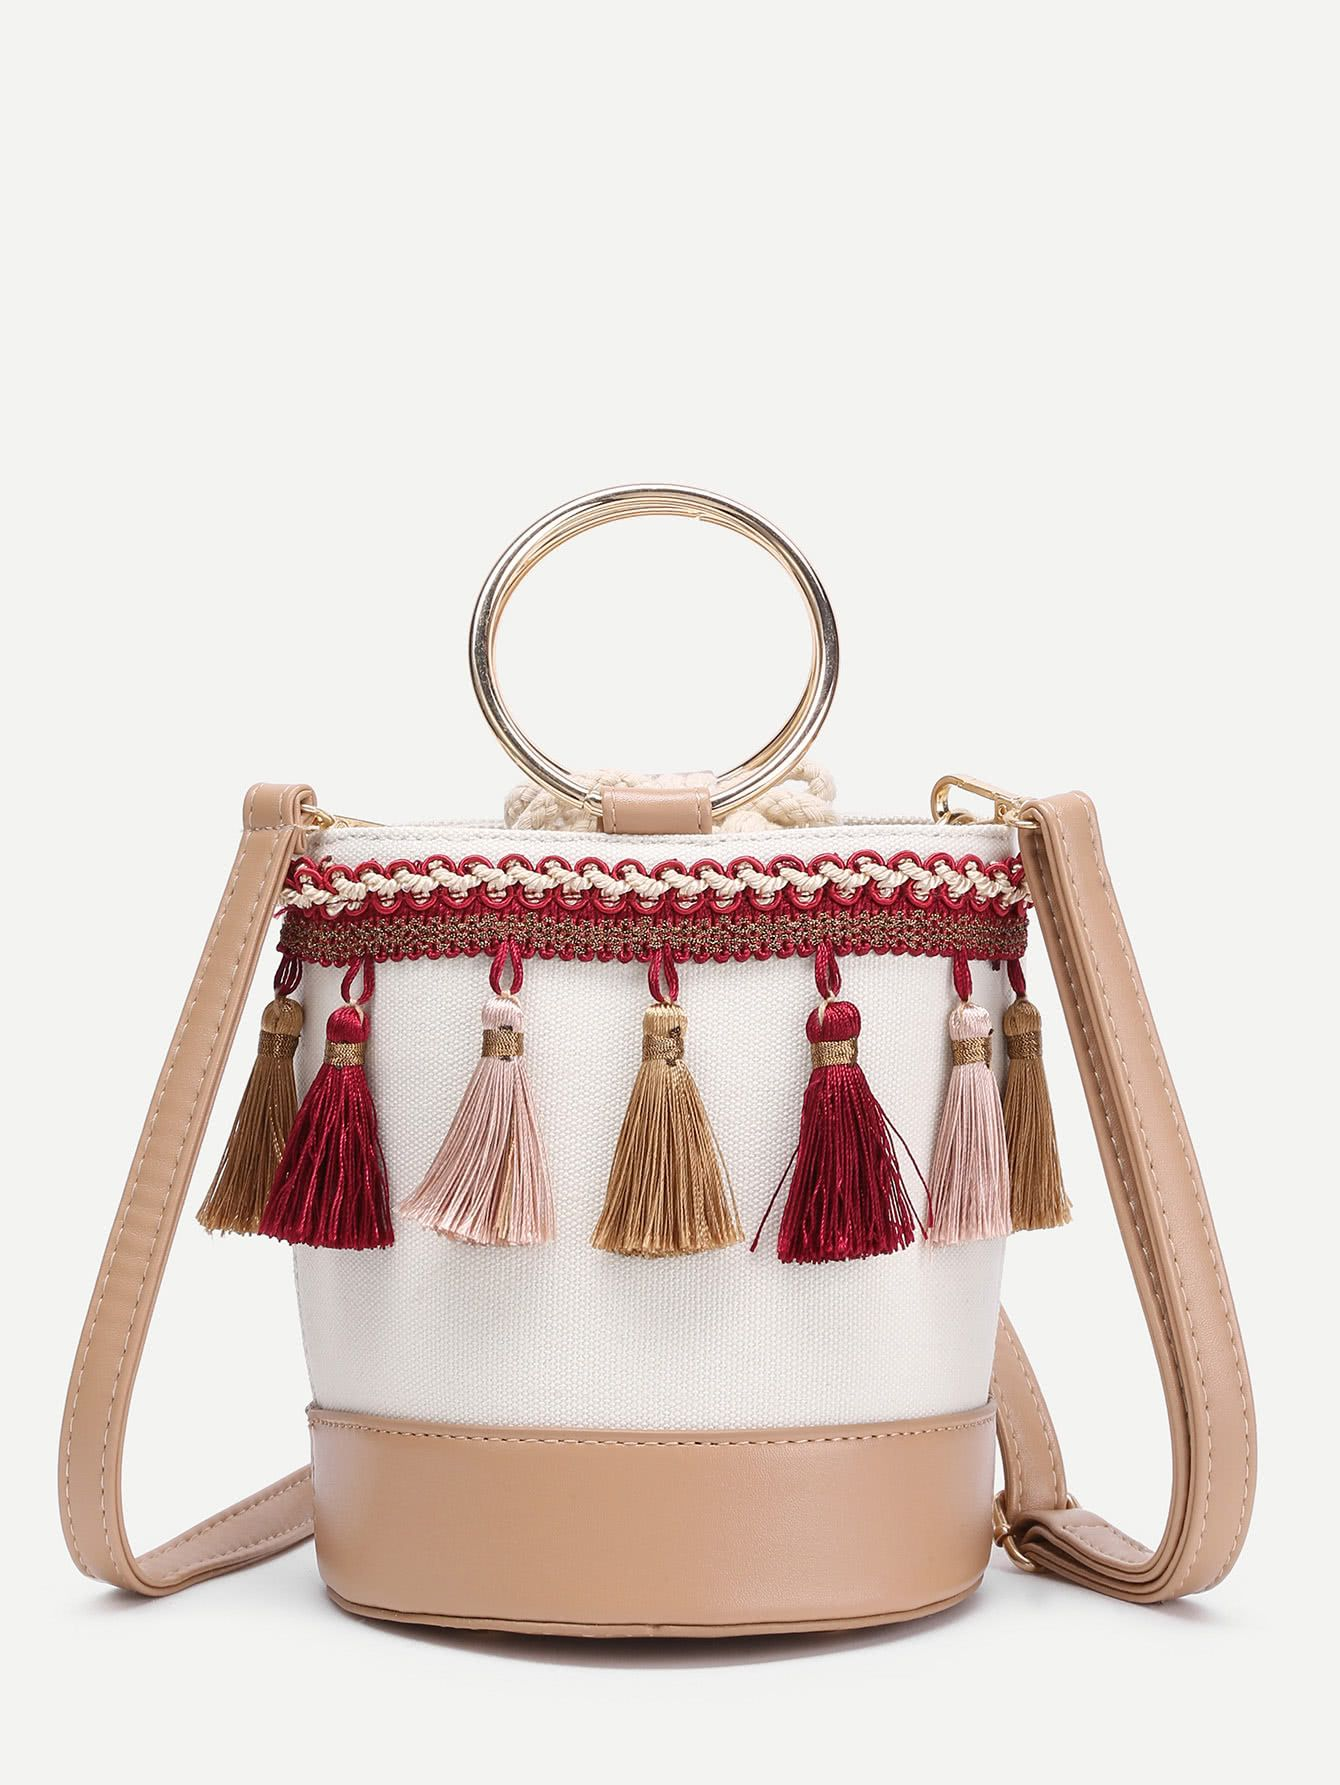 Tassel Decorated Bucket Bag With Ring Handle -SheIn(Sheinside ... 34acbd89c9da9